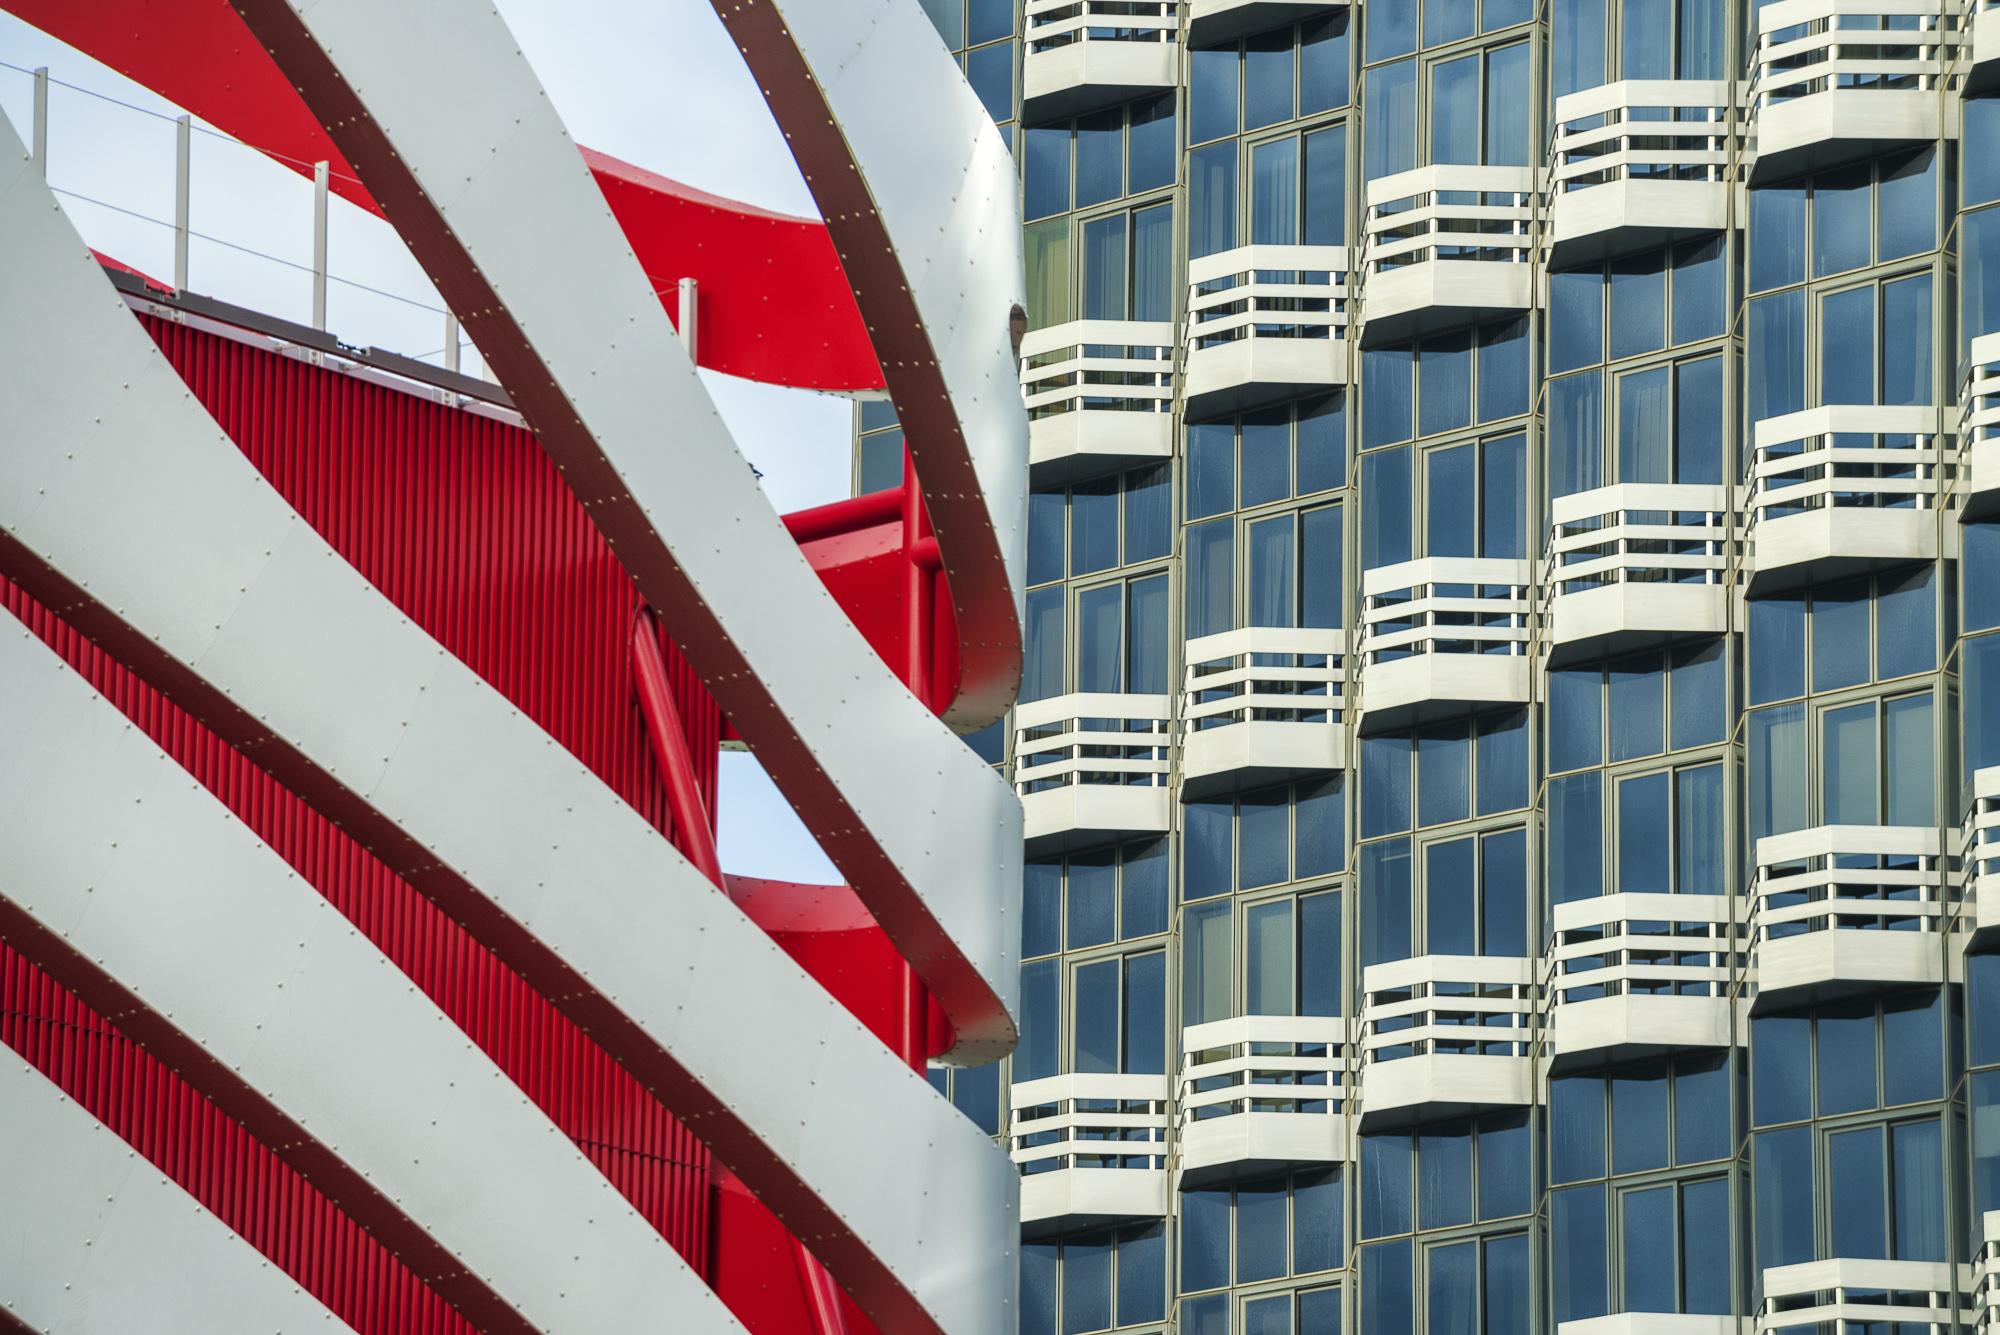 Modern Architecture Detail, Peterson Automotive Museum Building, Los Angeles, CA, USA